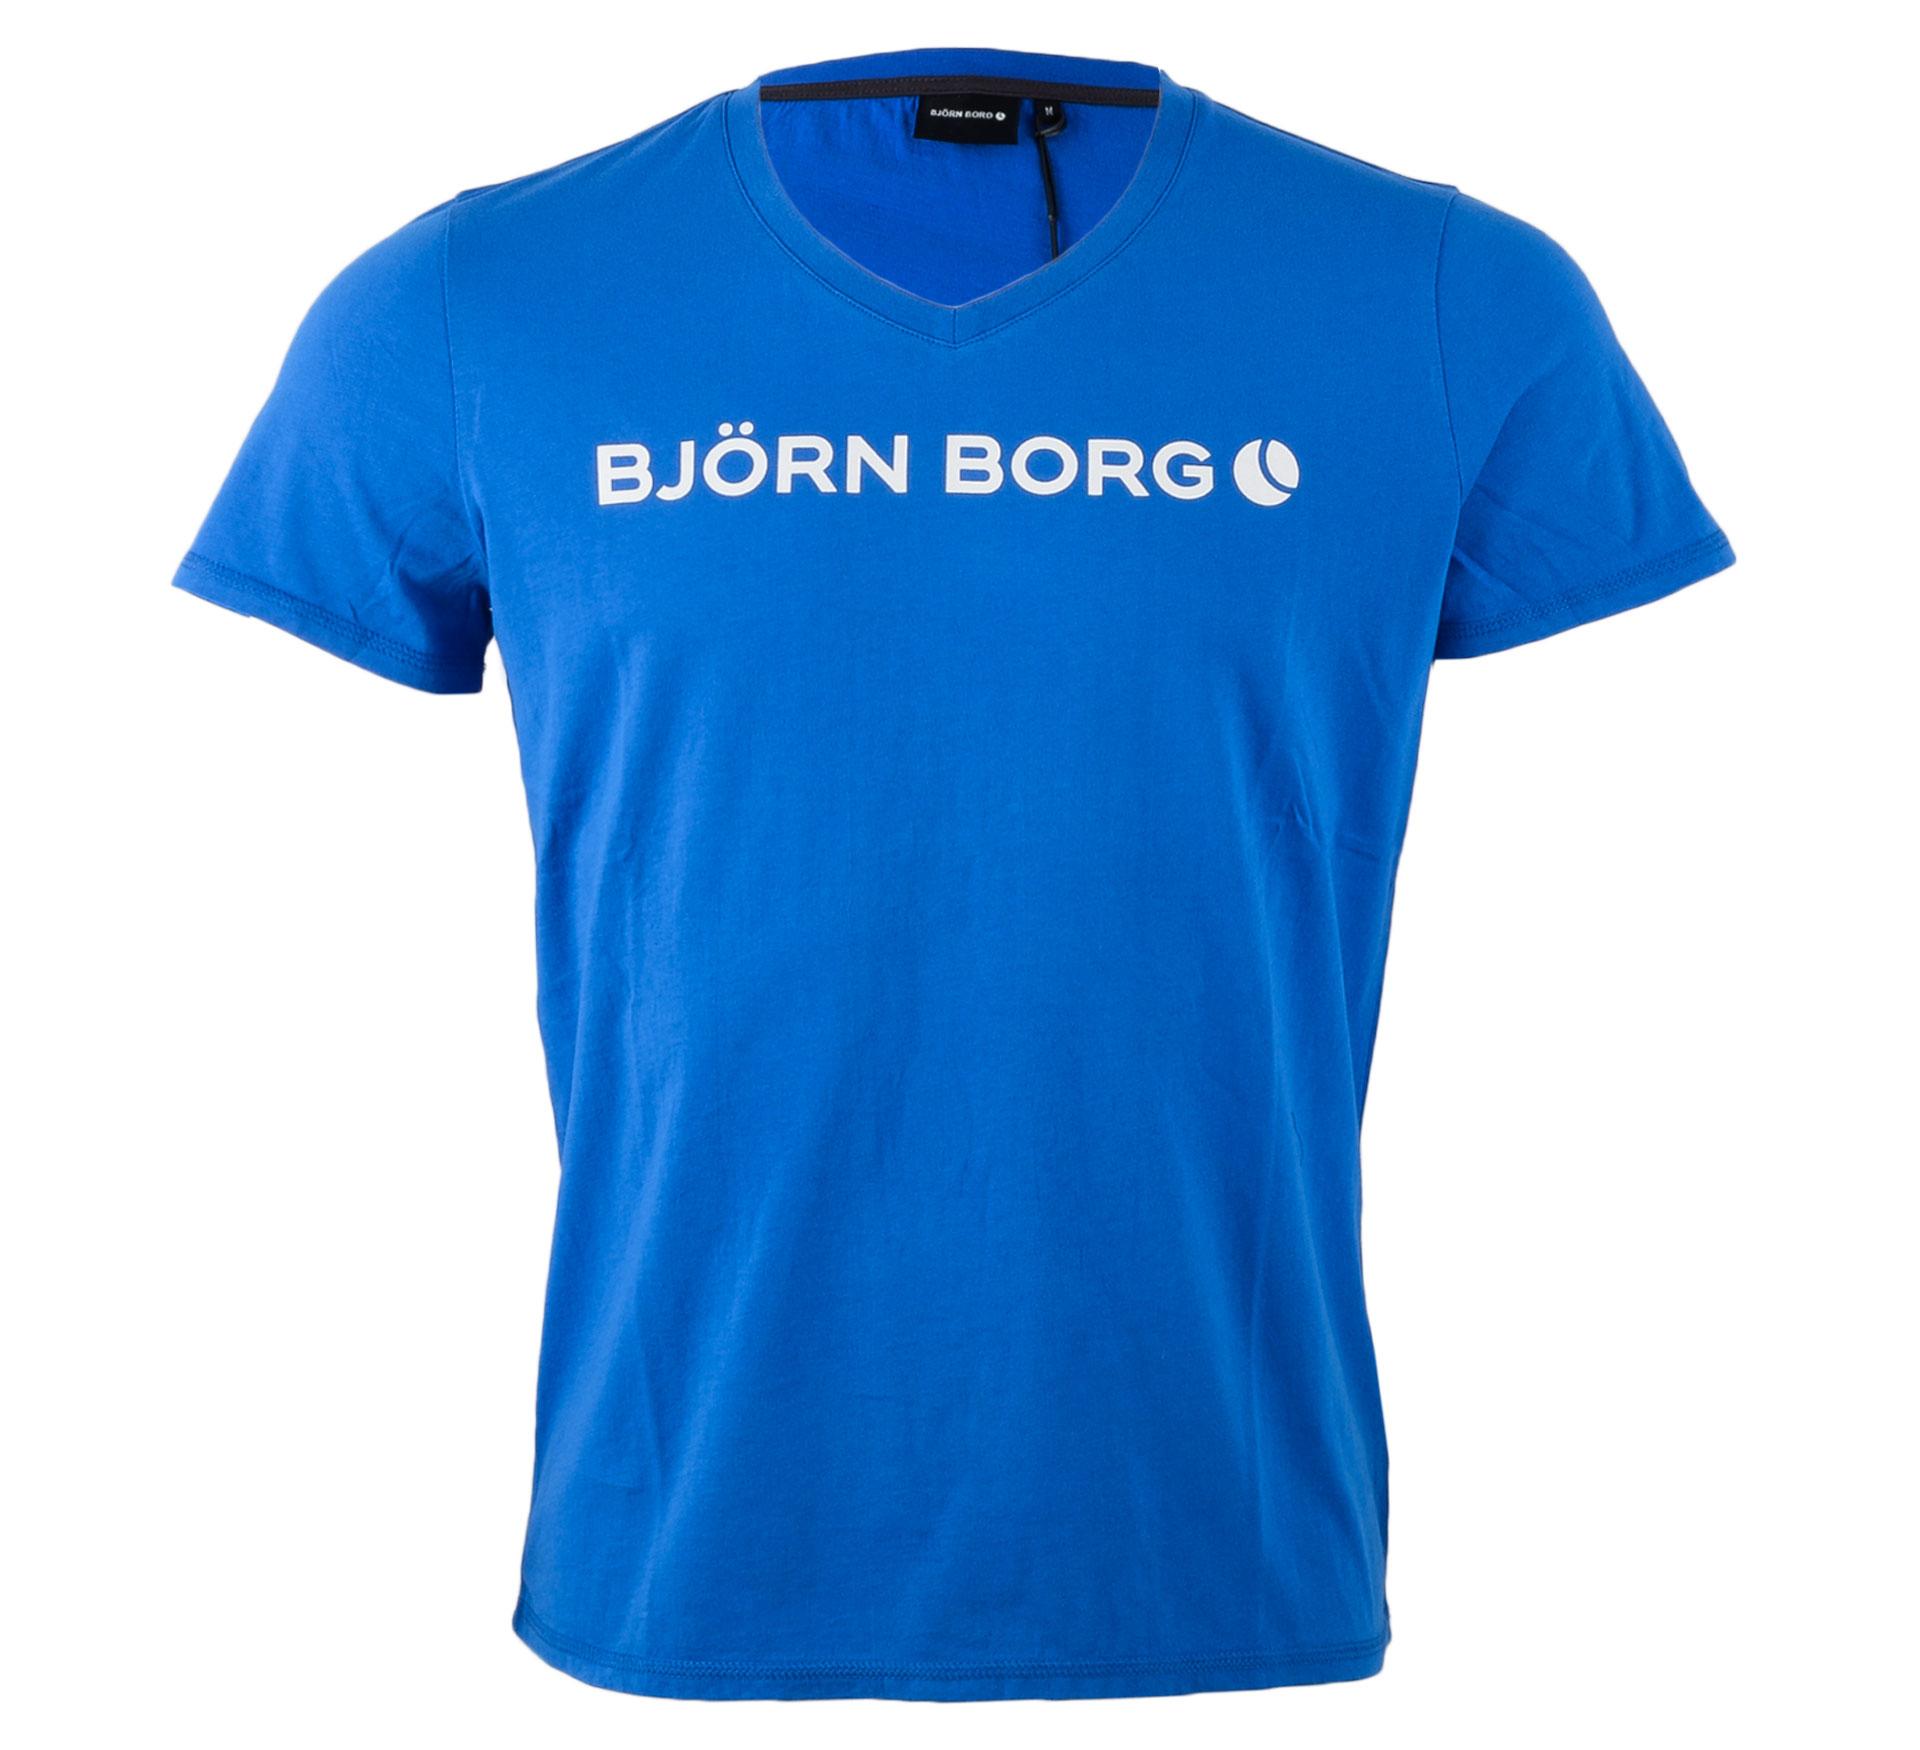 Bjorn Borg Björn Borg Secco T-shirt Heren blauw